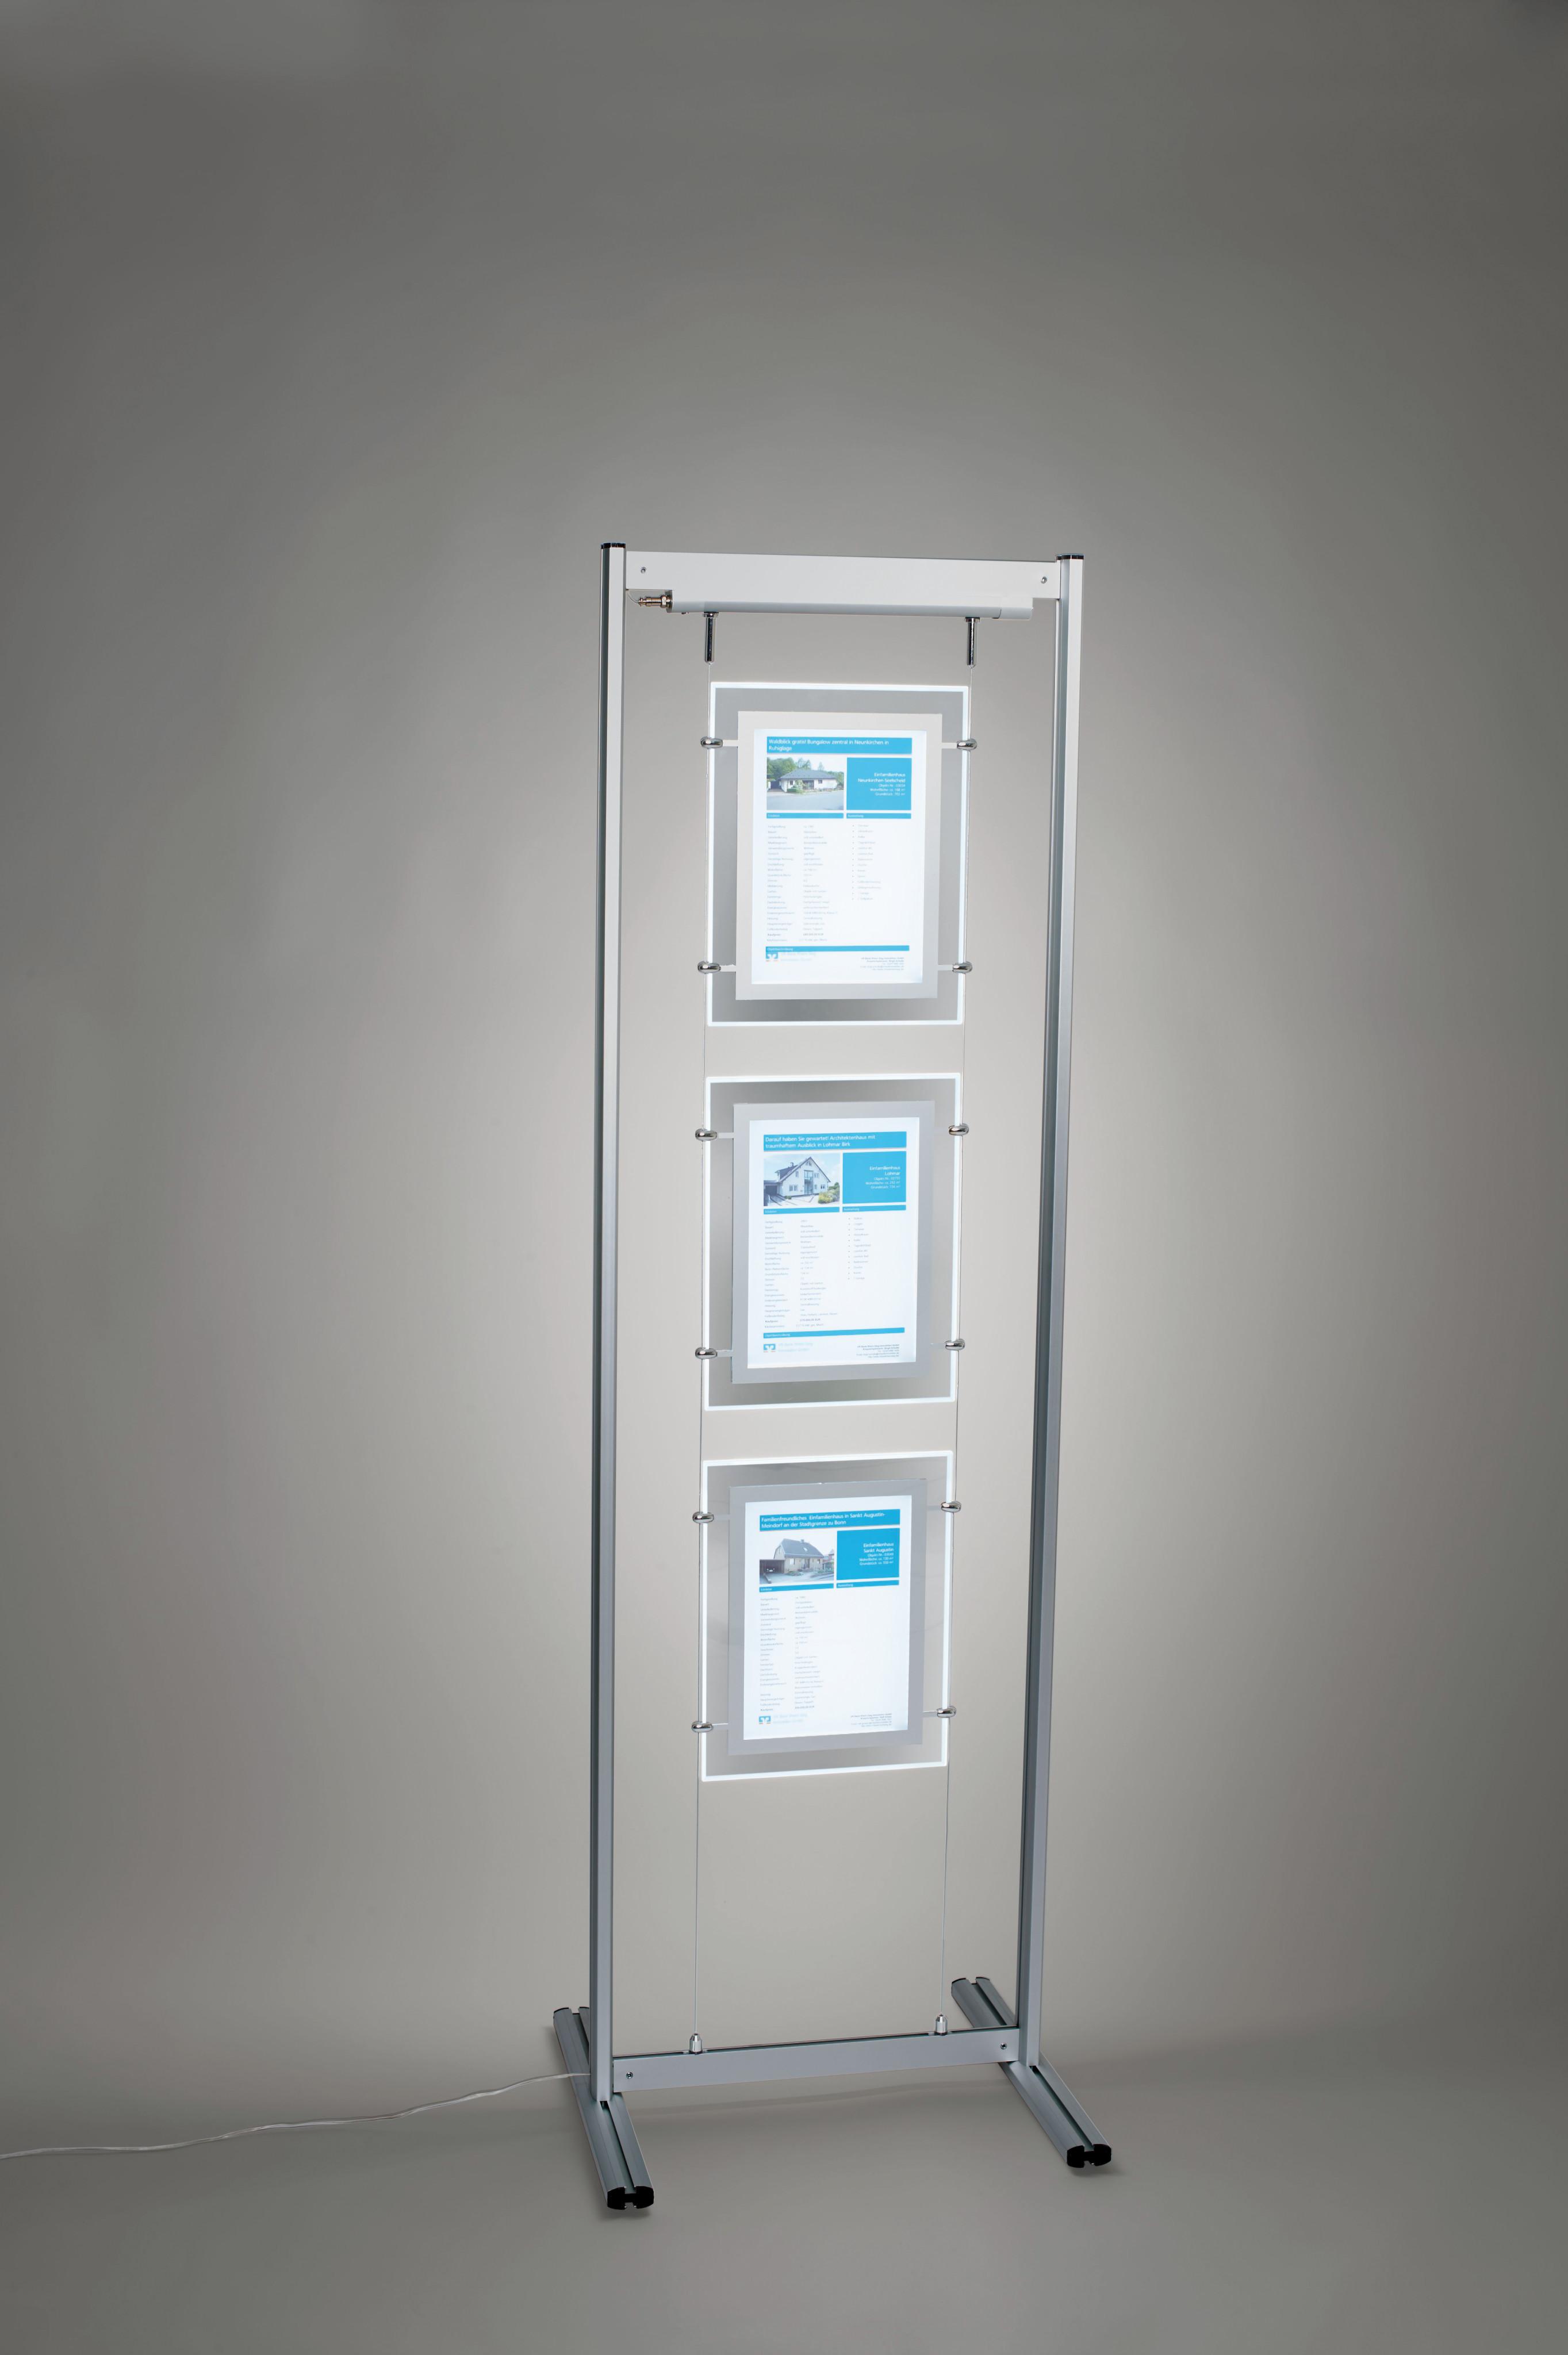 AcryLED Leuchtrahmen, doppelseitig, 8x DIN A4 Hochformat, Deckenabhängung